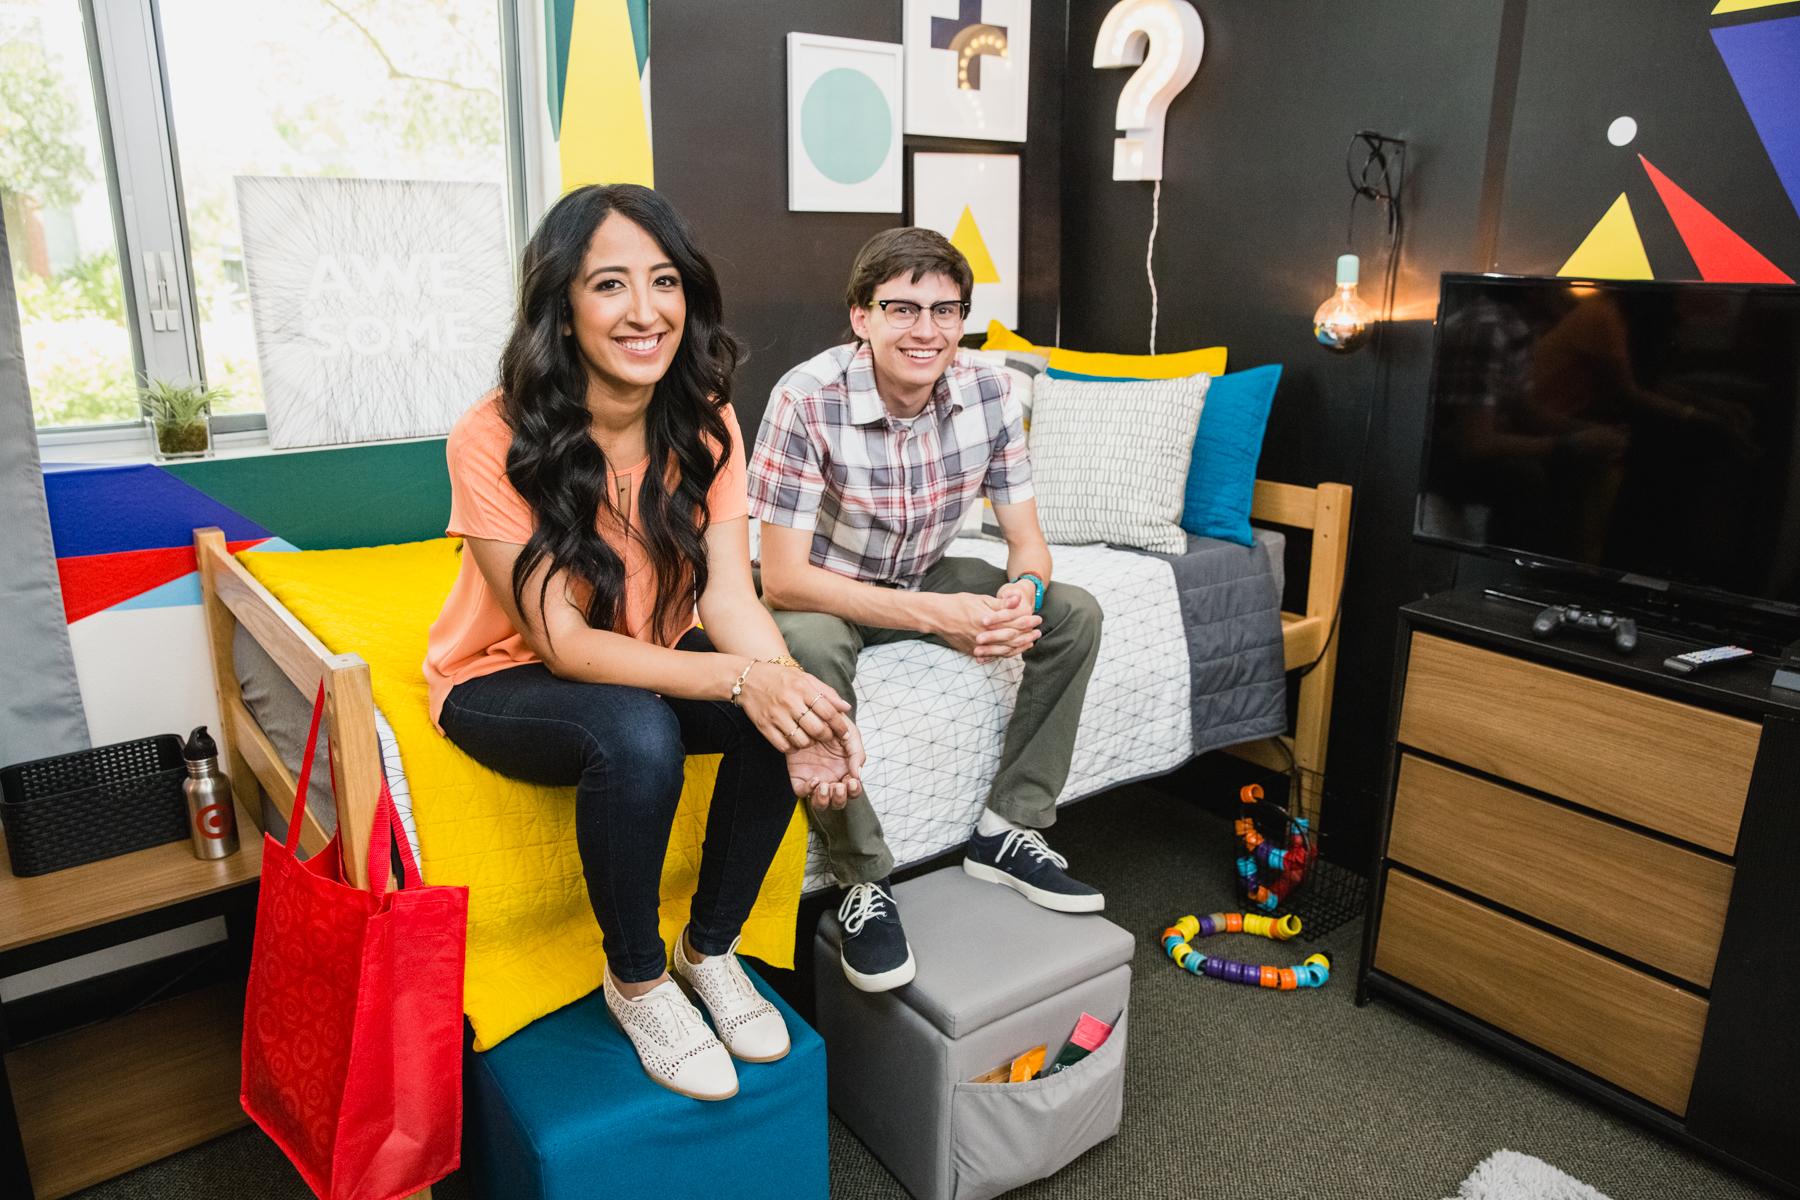 Designer Veronica Valencia and Gamer Nolan